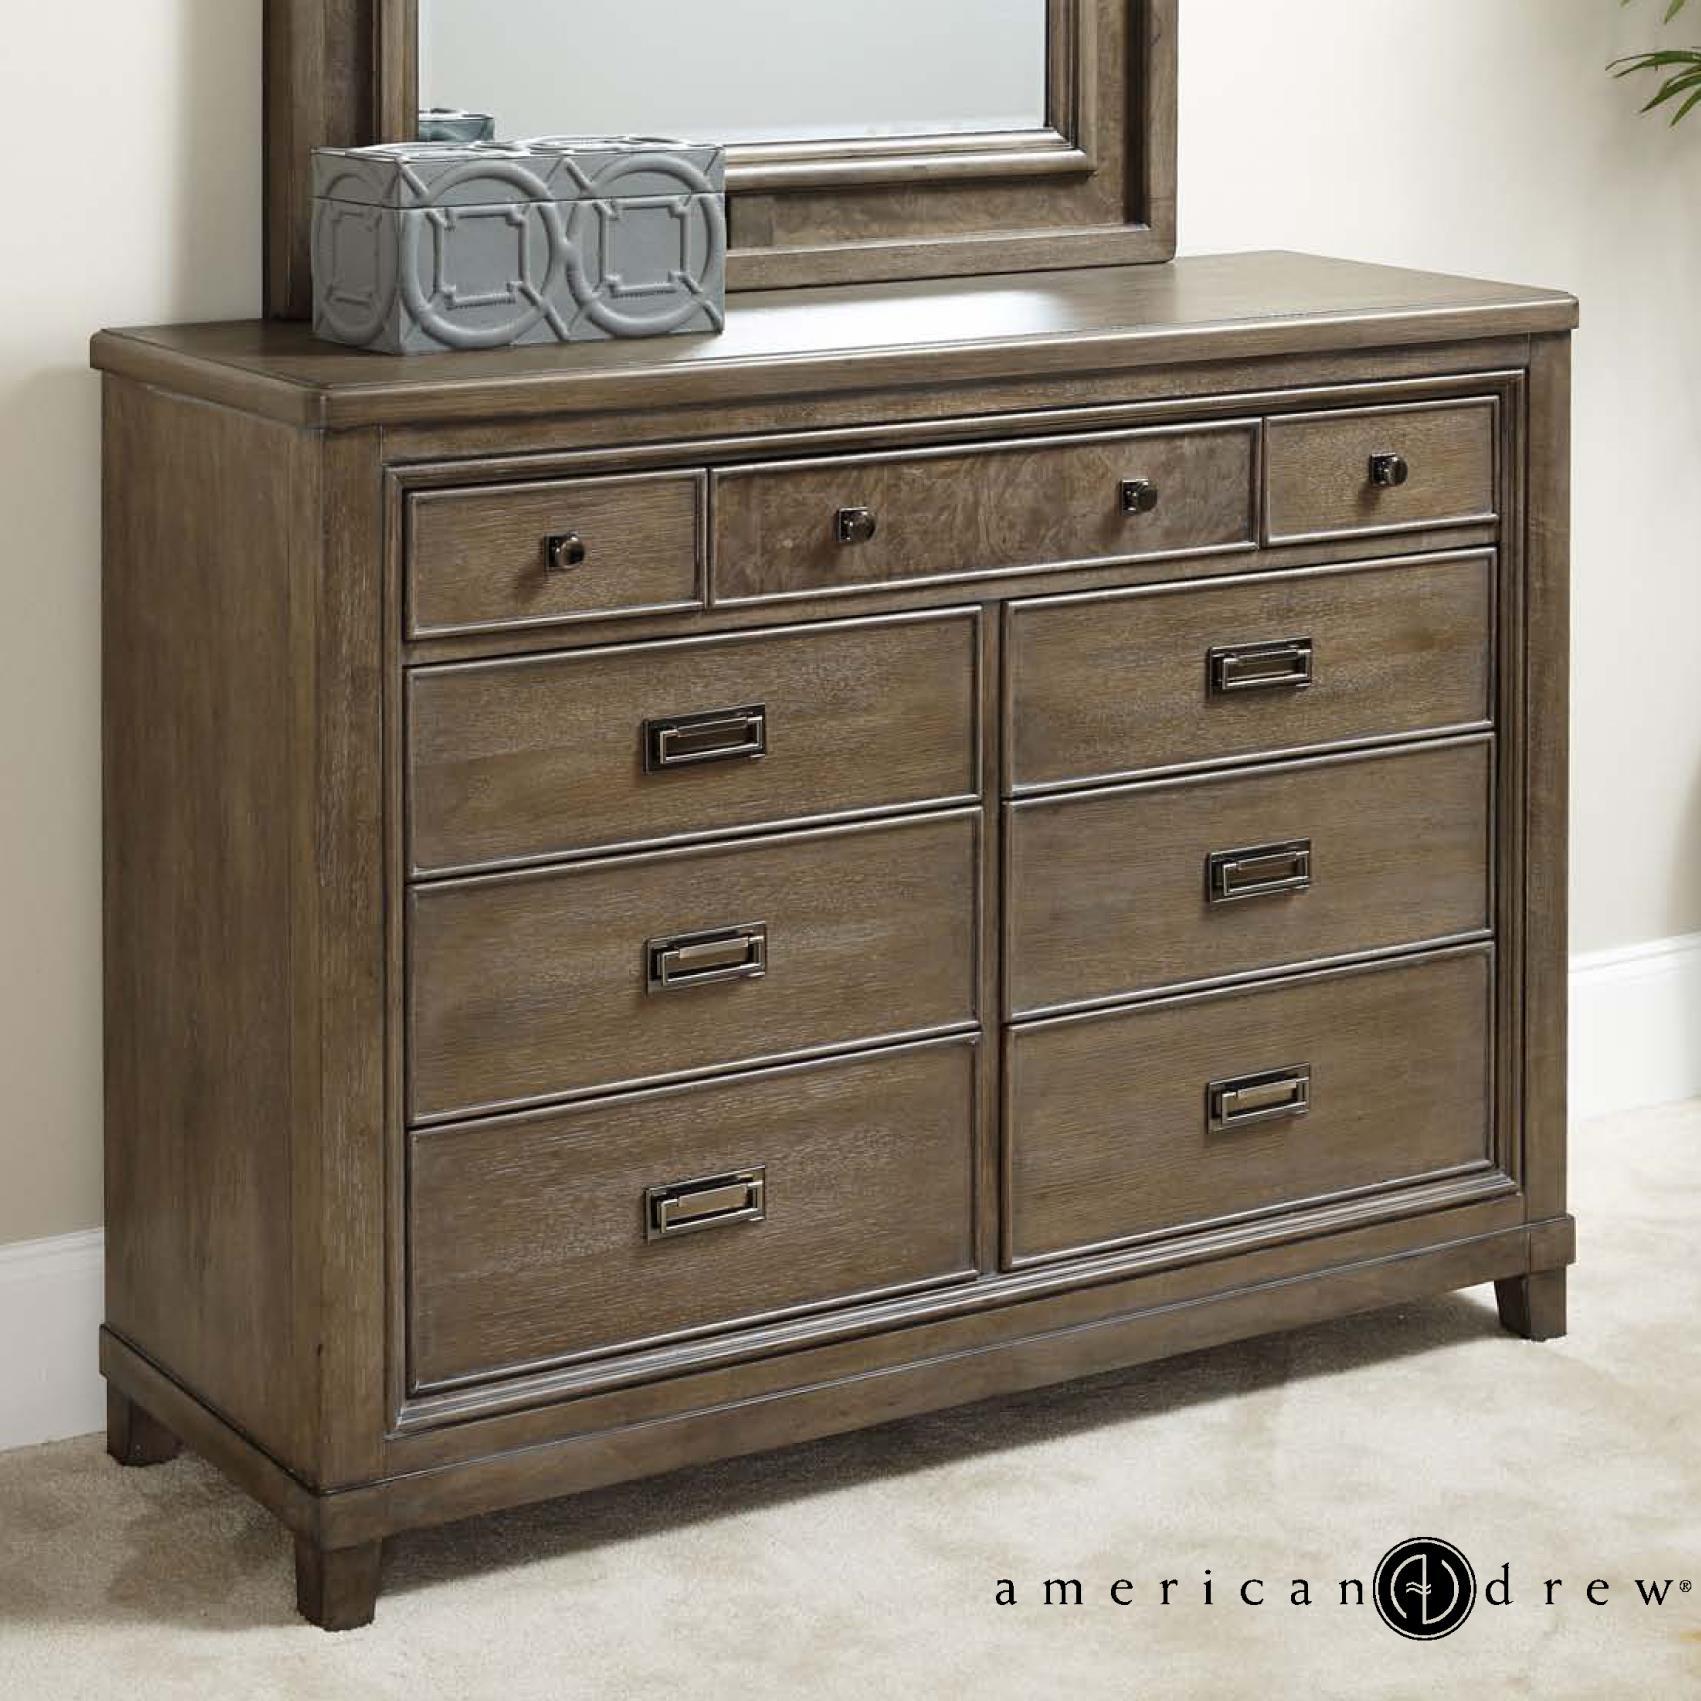 American Drew Park Studio 9-Drawer Dresser - Item Number: 488-131